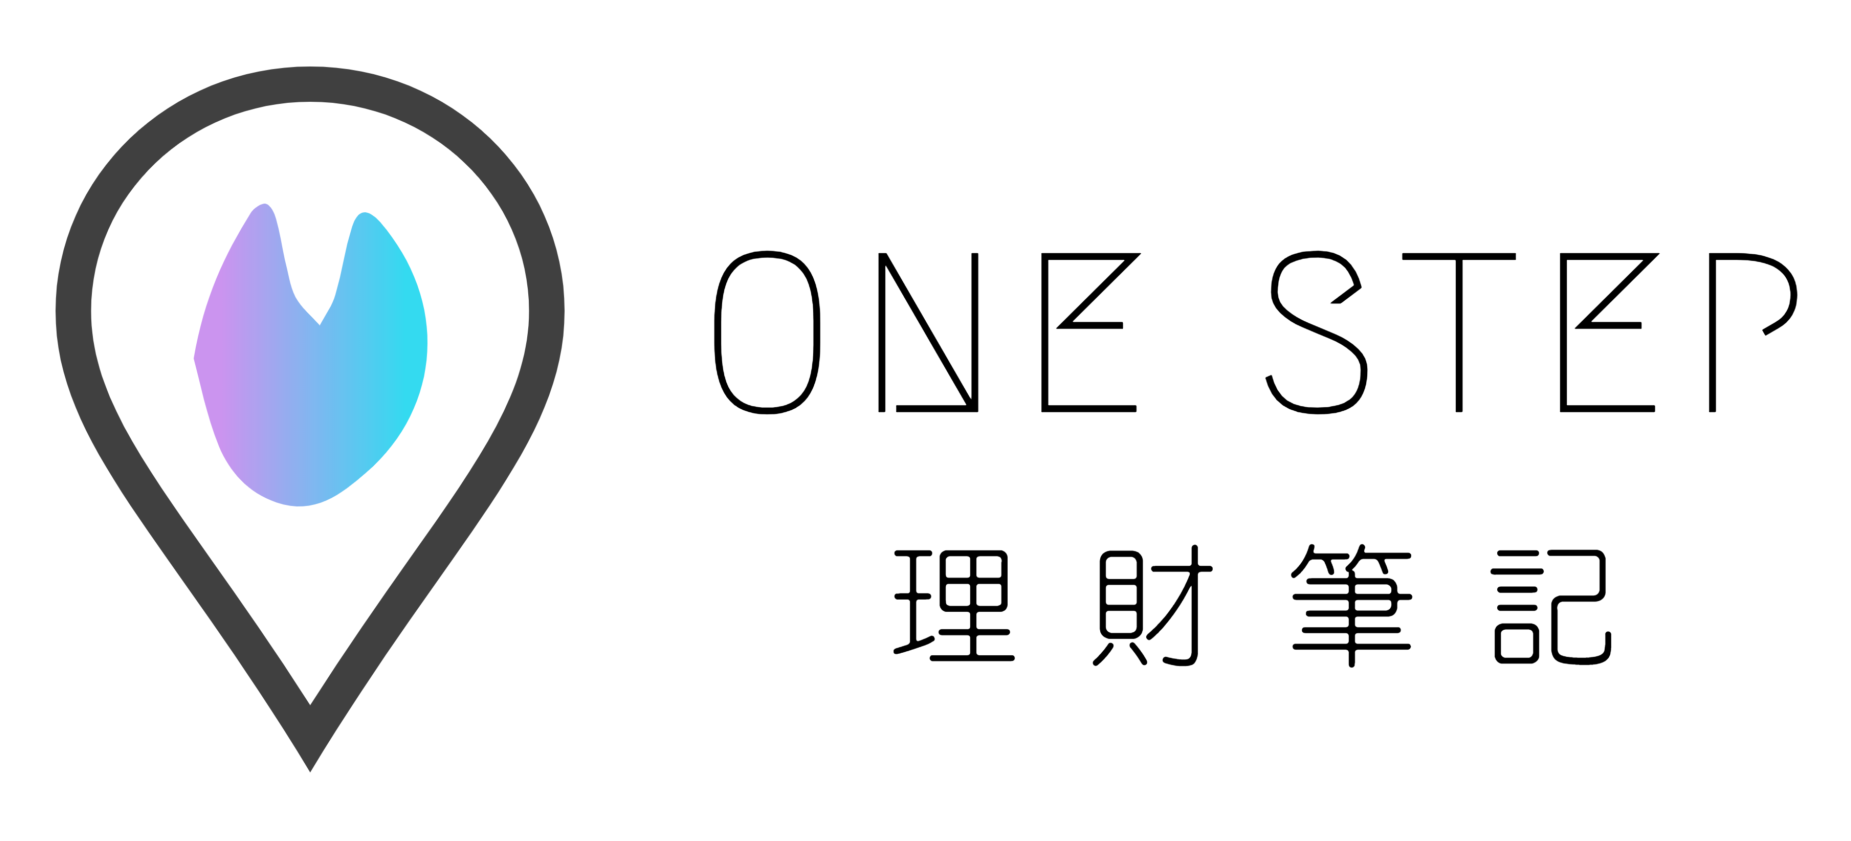 One Step 理財筆記